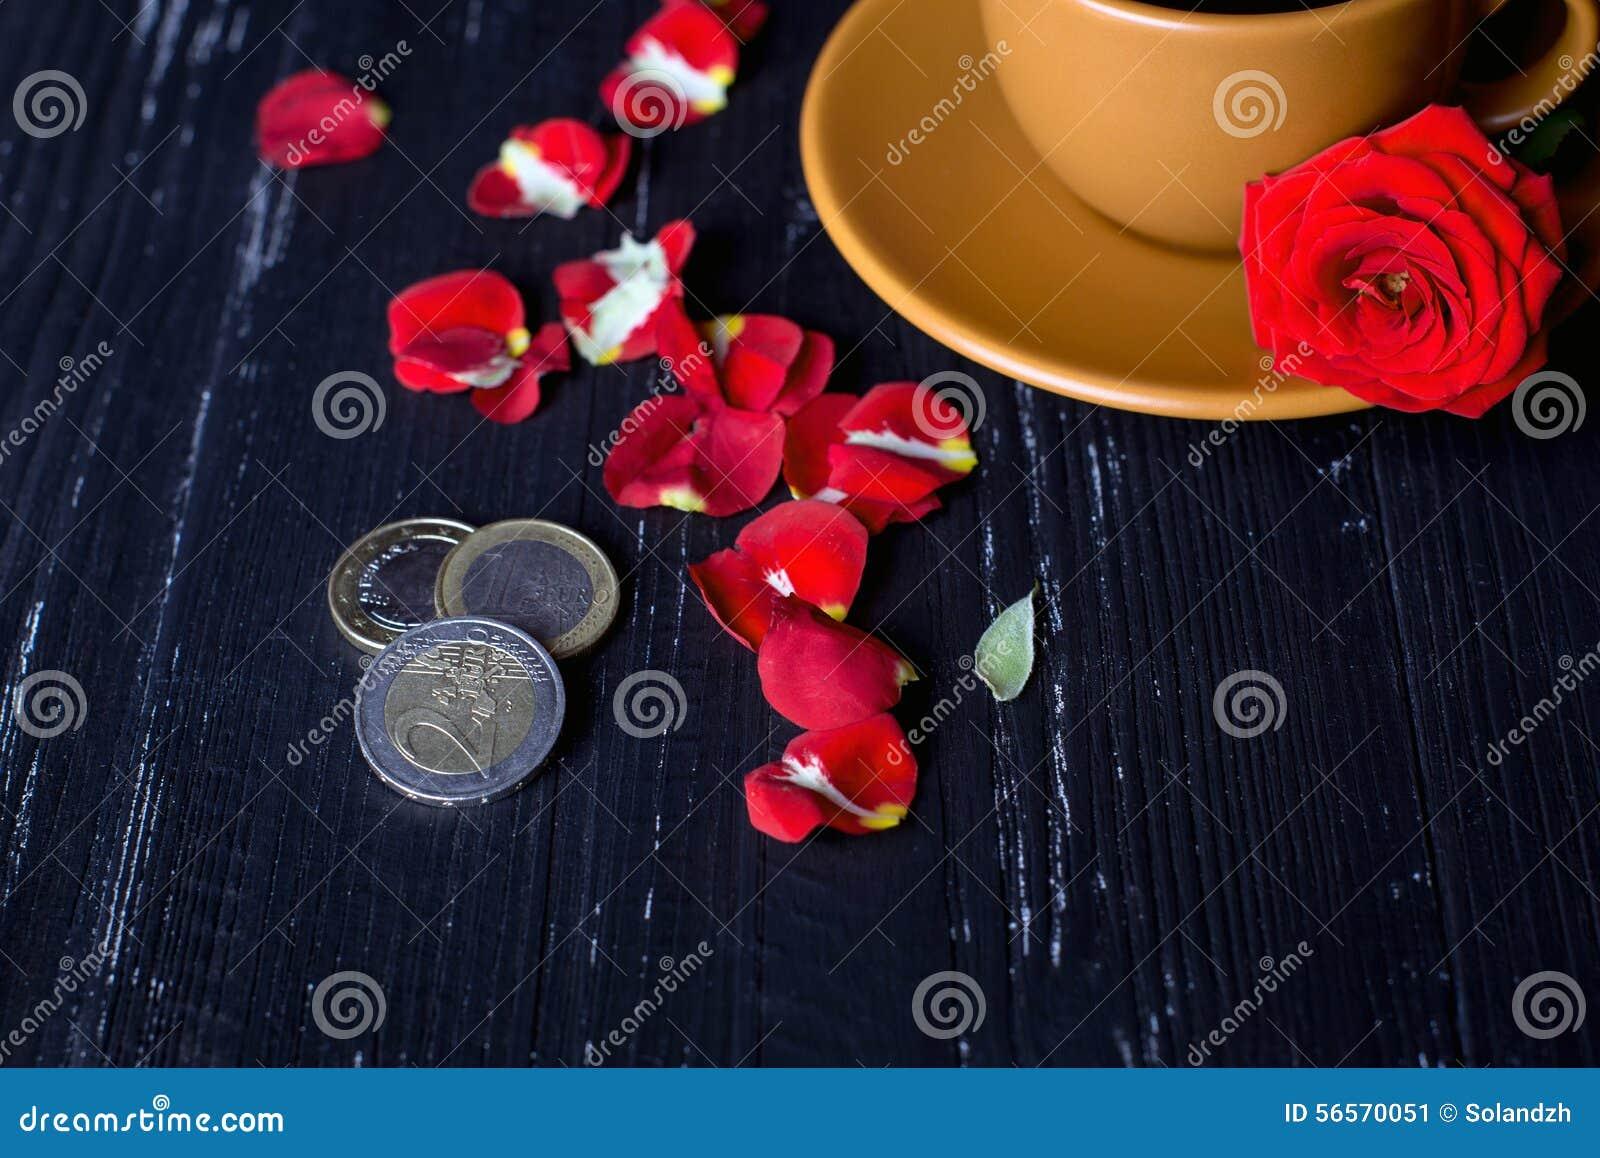 Download Πορτοκαλί φλυτζάνι καφέ με τα ροδαλά πέταλα και τα ευρο- νομίσματα στο μαύρο υπόβαθρο Στοκ Εικόνα - εικόνα από κούπα, λουλούδι: 56570051